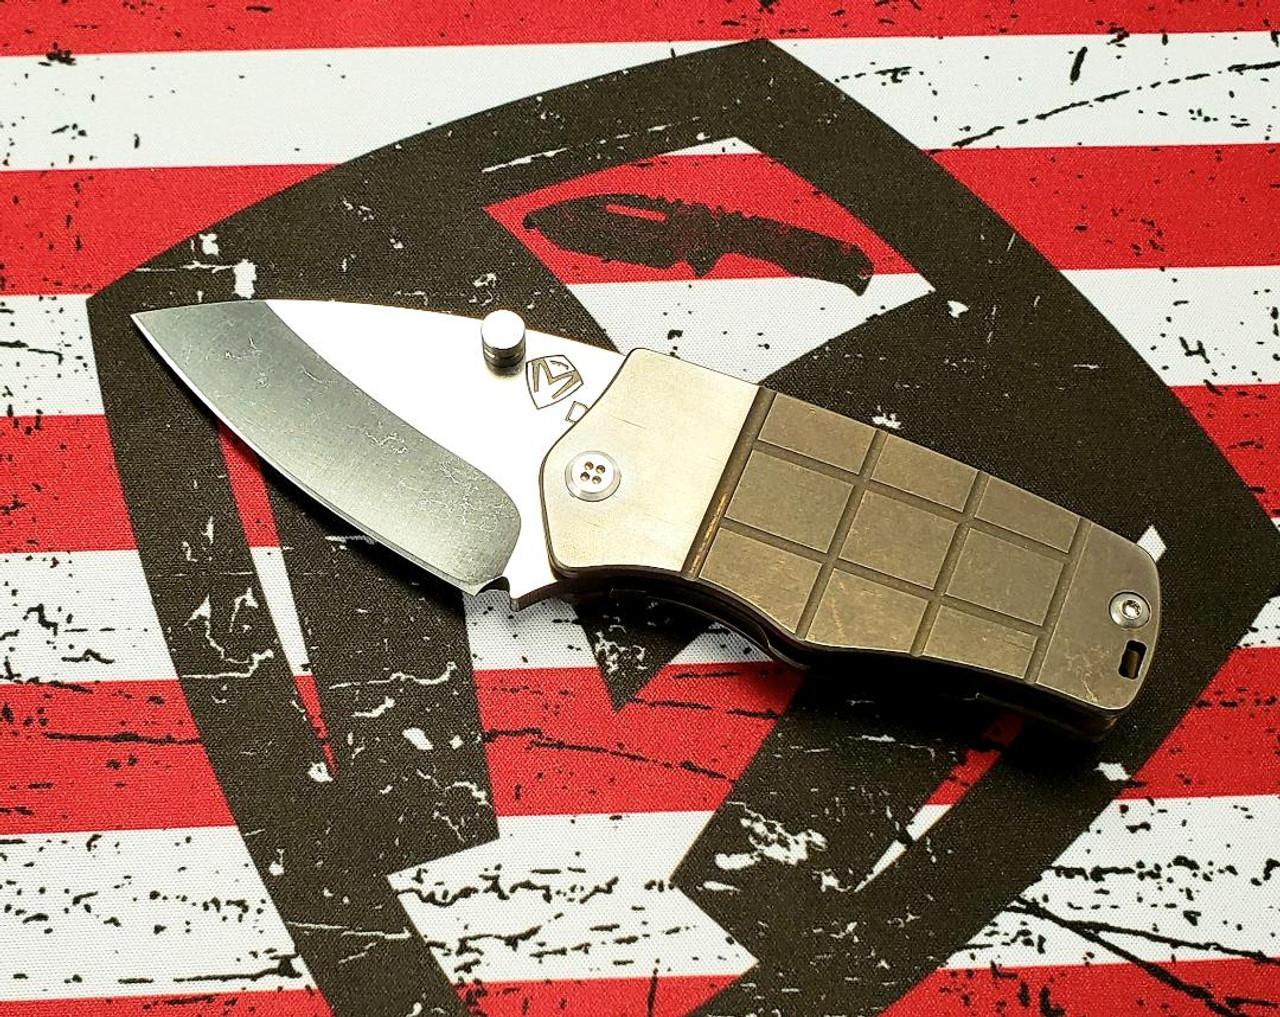 Medford Sherman - D2 Tumbled Blade - Ano Bronze Handle